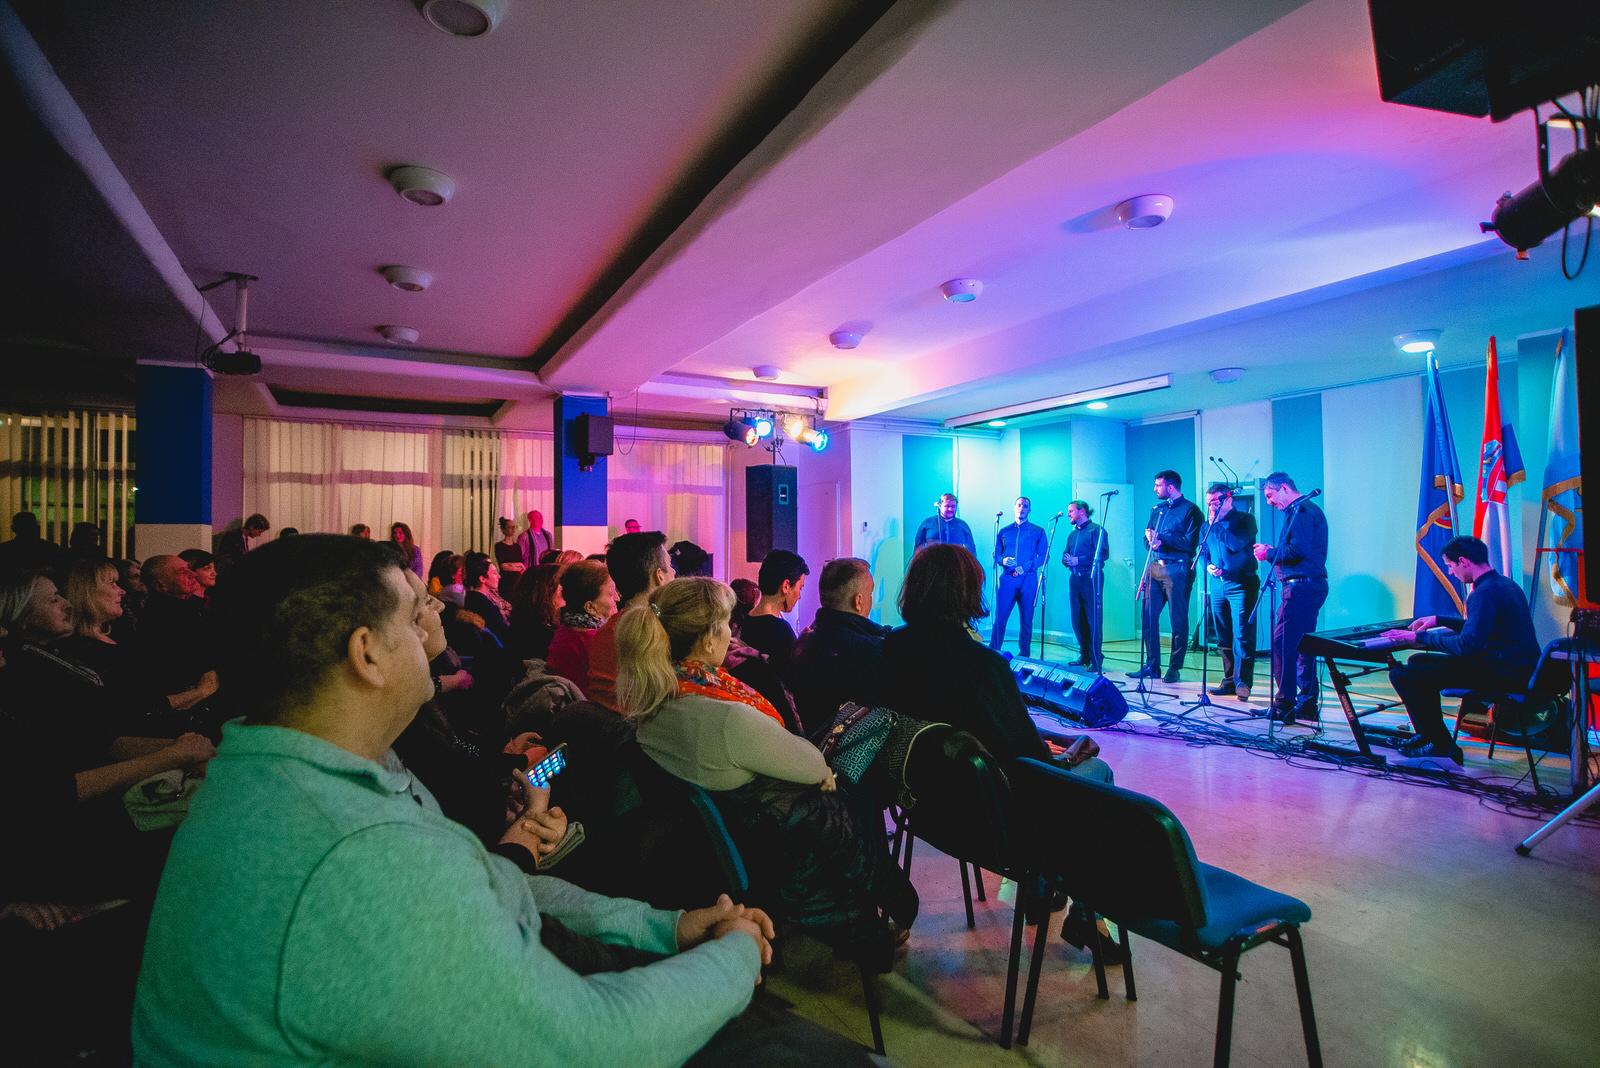 likaclub_koncert-klapa-cambi_kic-gospić_2019-20